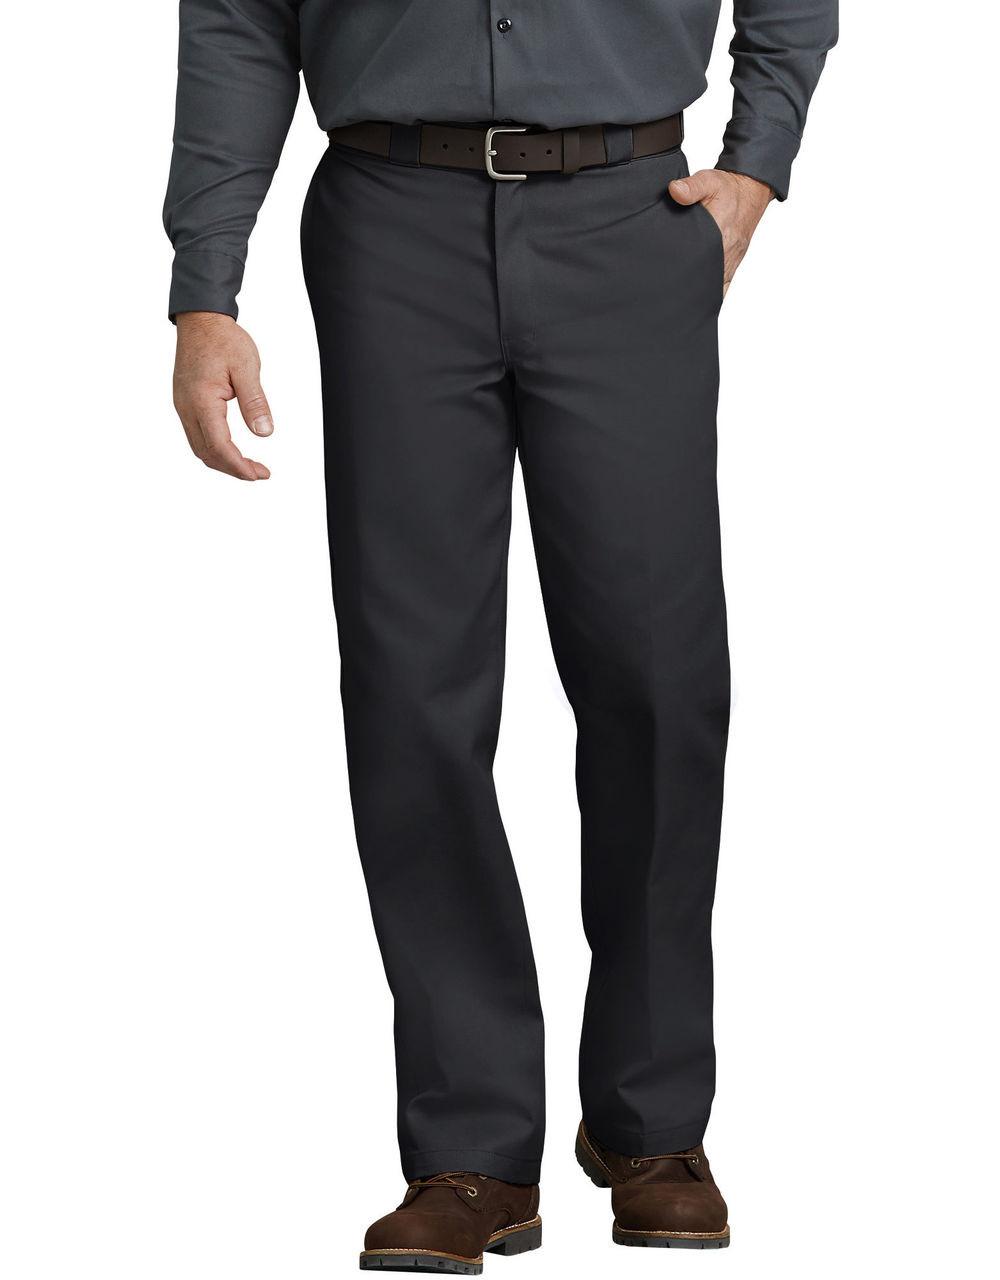 Dickies 874 Pantalones Original Trabajo Rudo Bodega De Uniformes Dickies Cherokee Grey S Anatomy